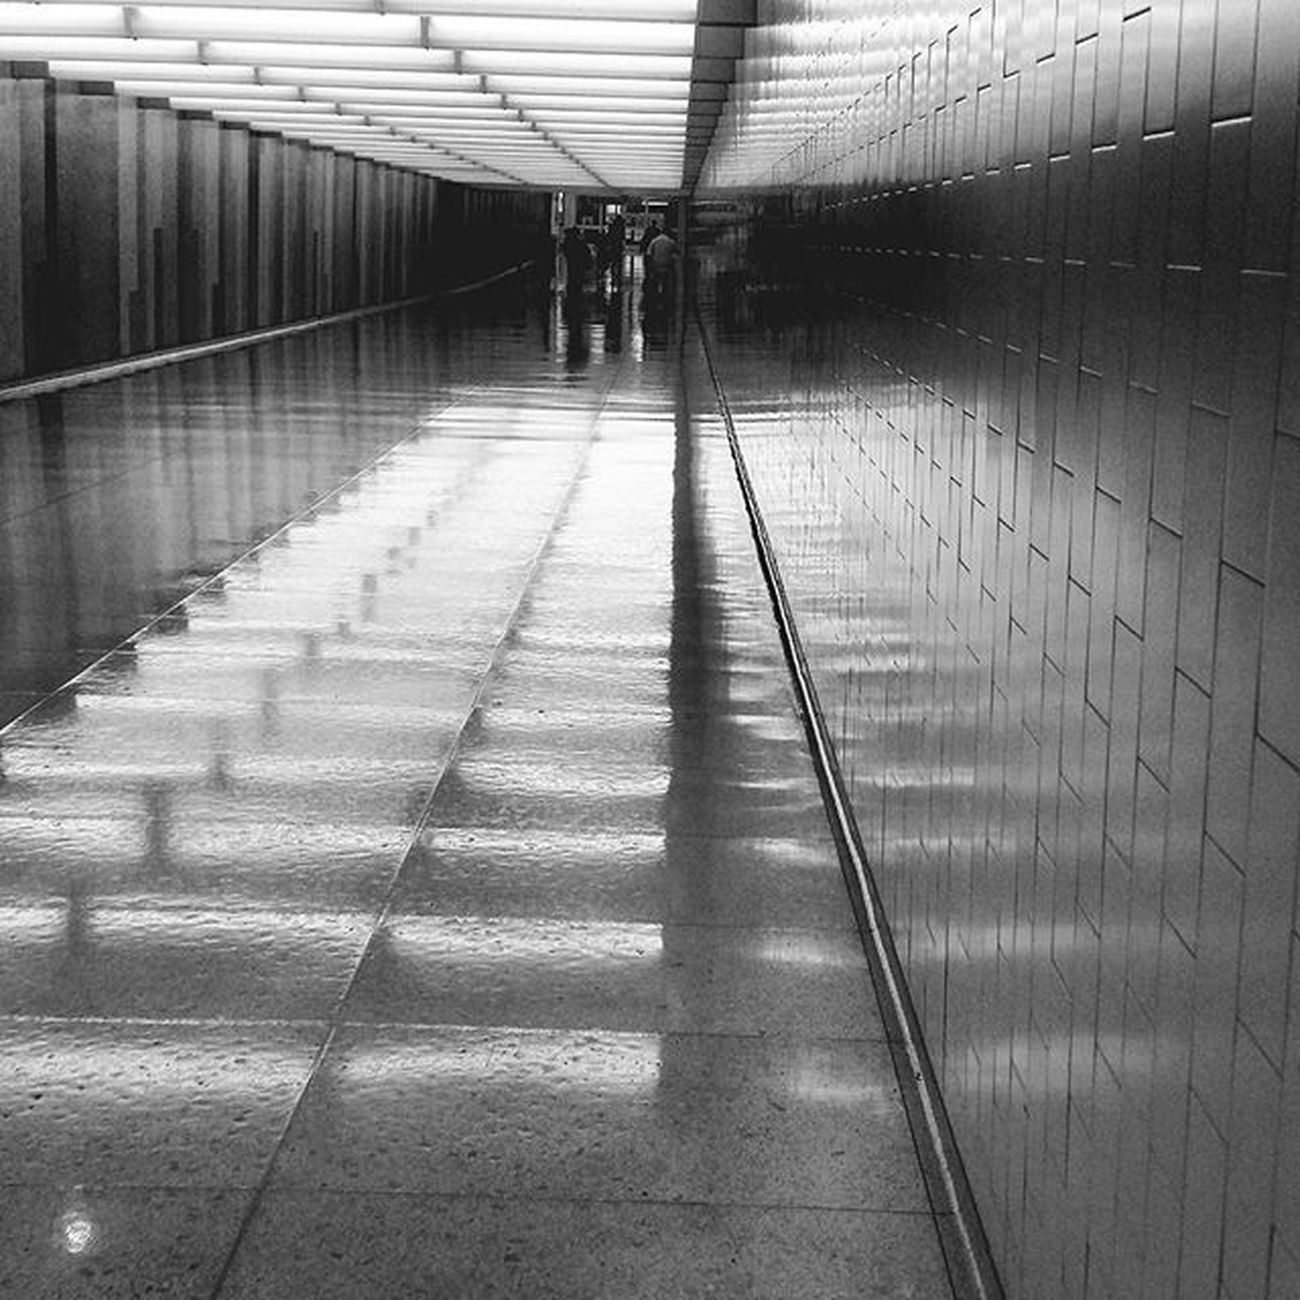 ✈La Cali Tunnel Terminal LAX Blackandwhite Blackandwhitephotography Bnw Bnw_globe Bnw_rose Bnw_captures Bnw_life Bnw_planet Bnw_society Bnw_LA Bnw_california Bnw_travel Bnw_photo Bnw_city Travel Perspective Architecture Nikon D3300